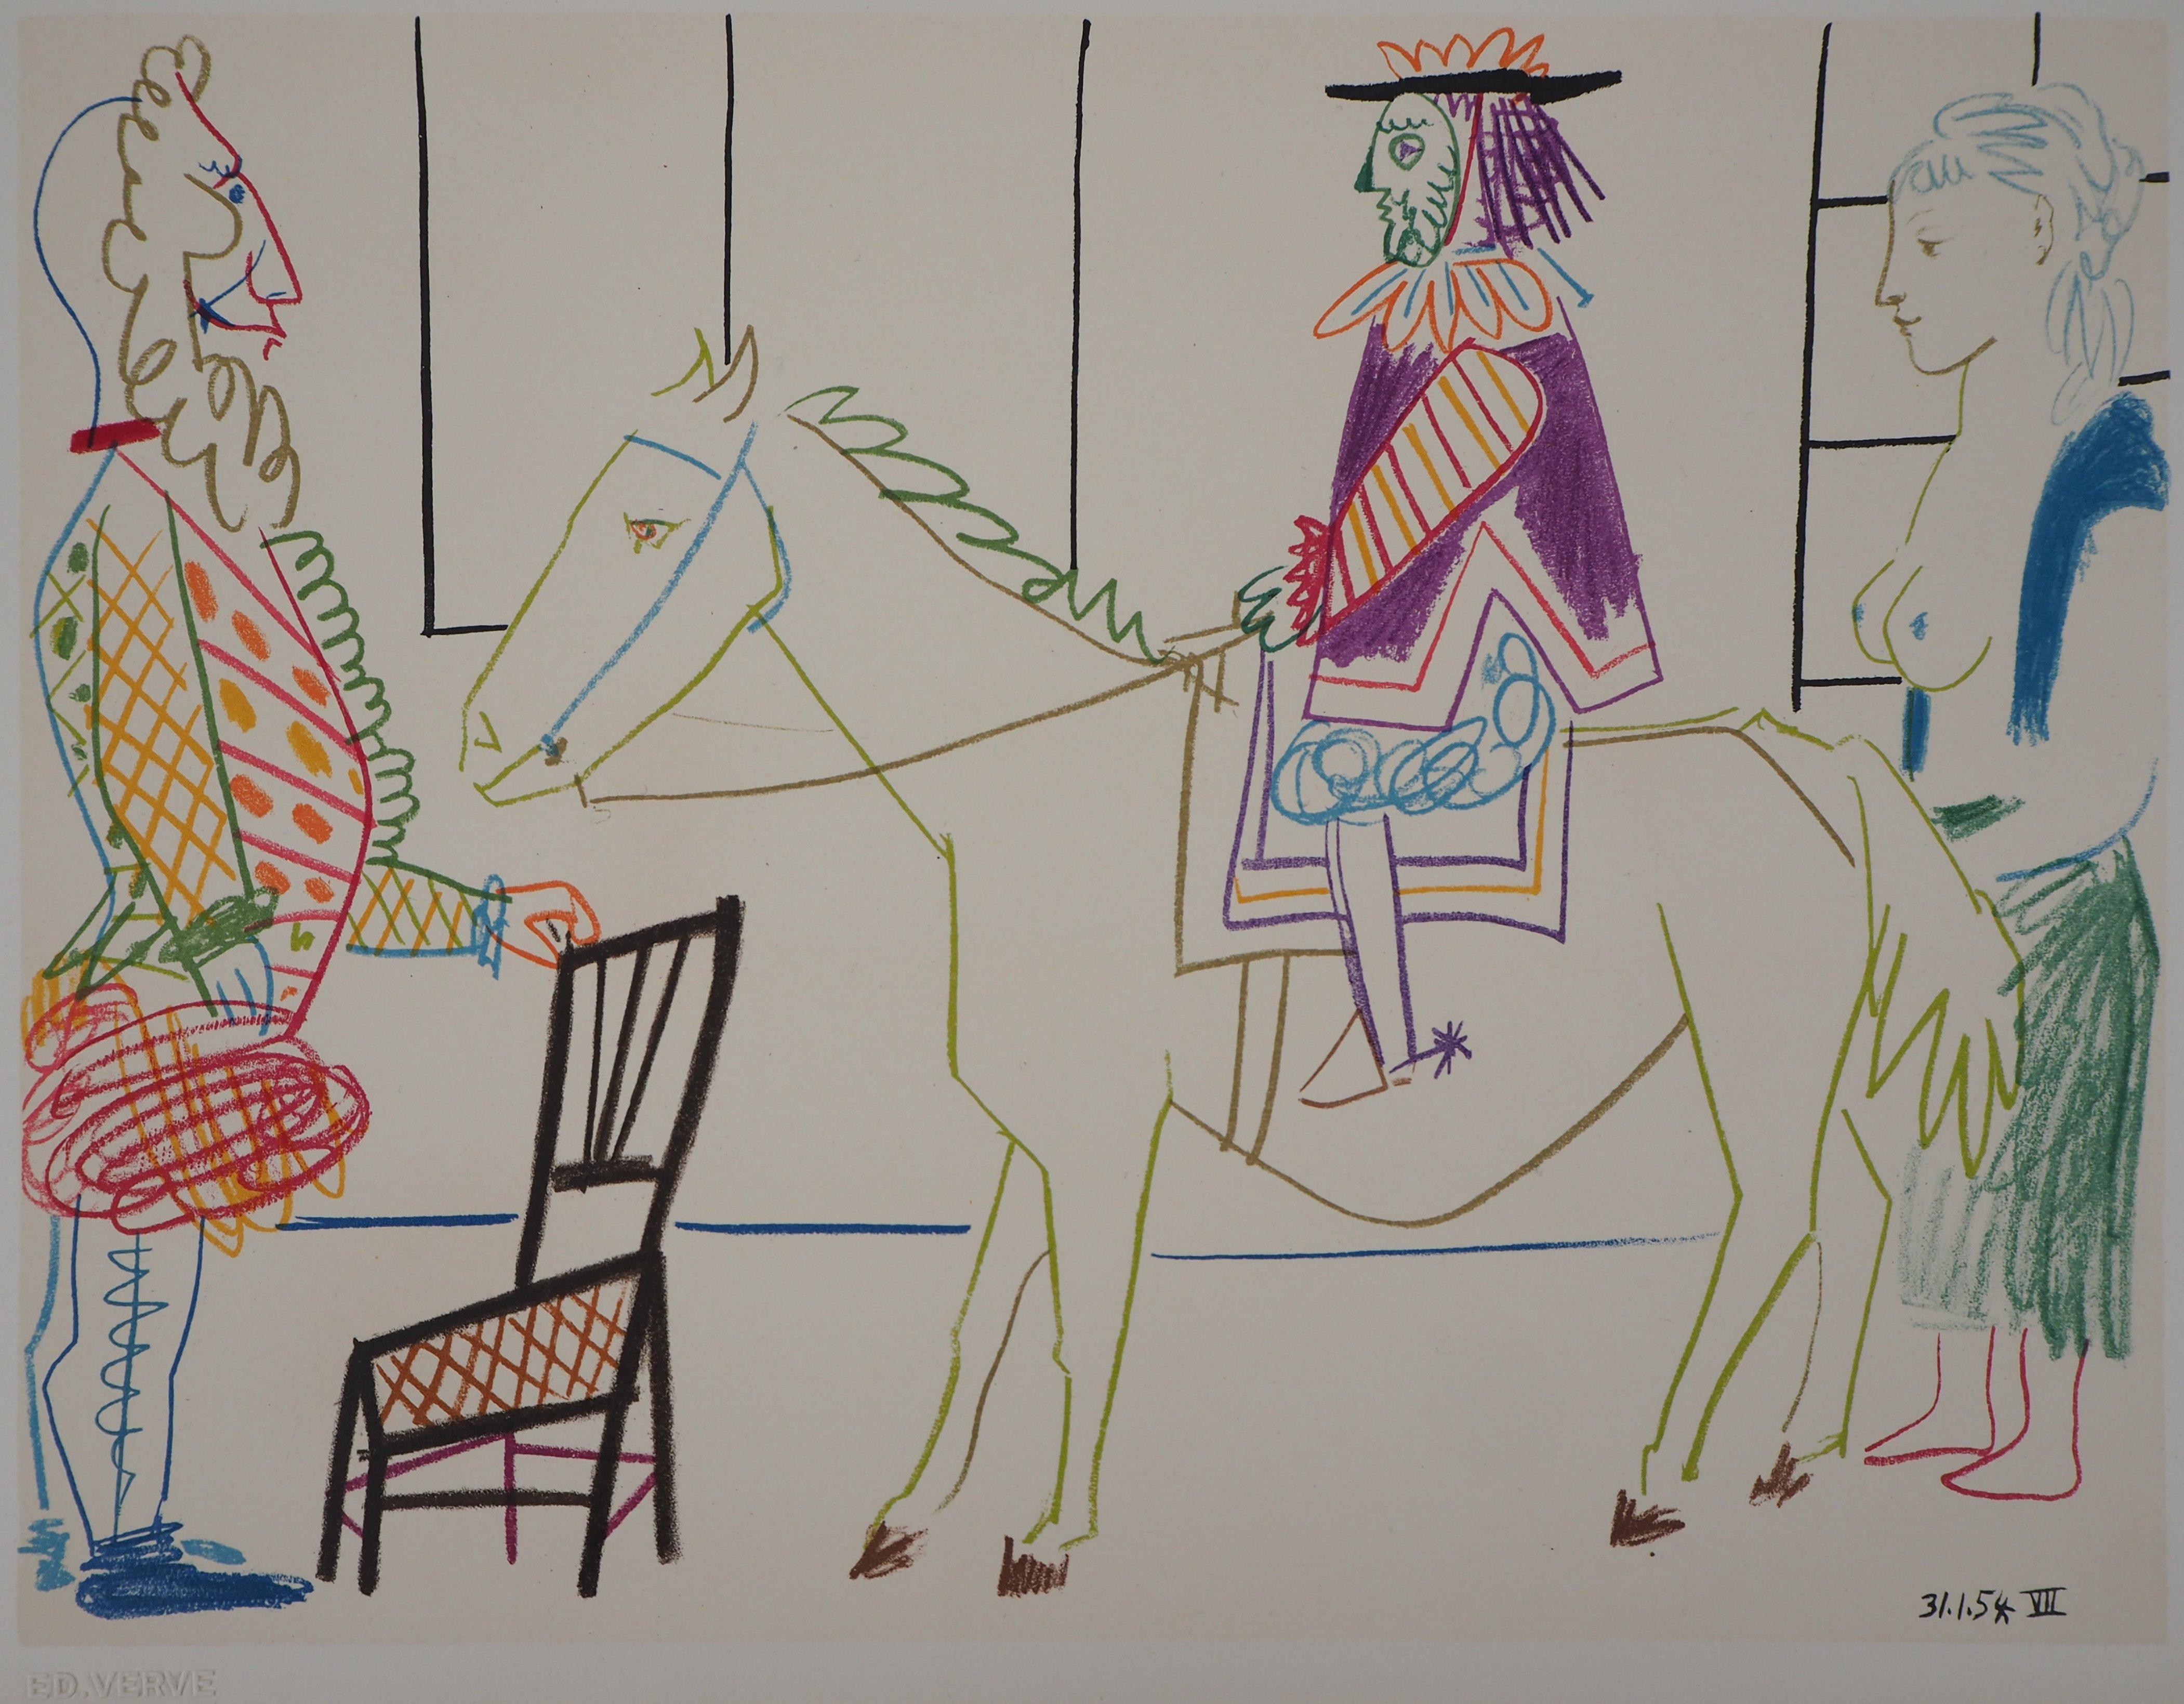 The Parade - Lithograph on Wove Paper - Verve, Mourlot